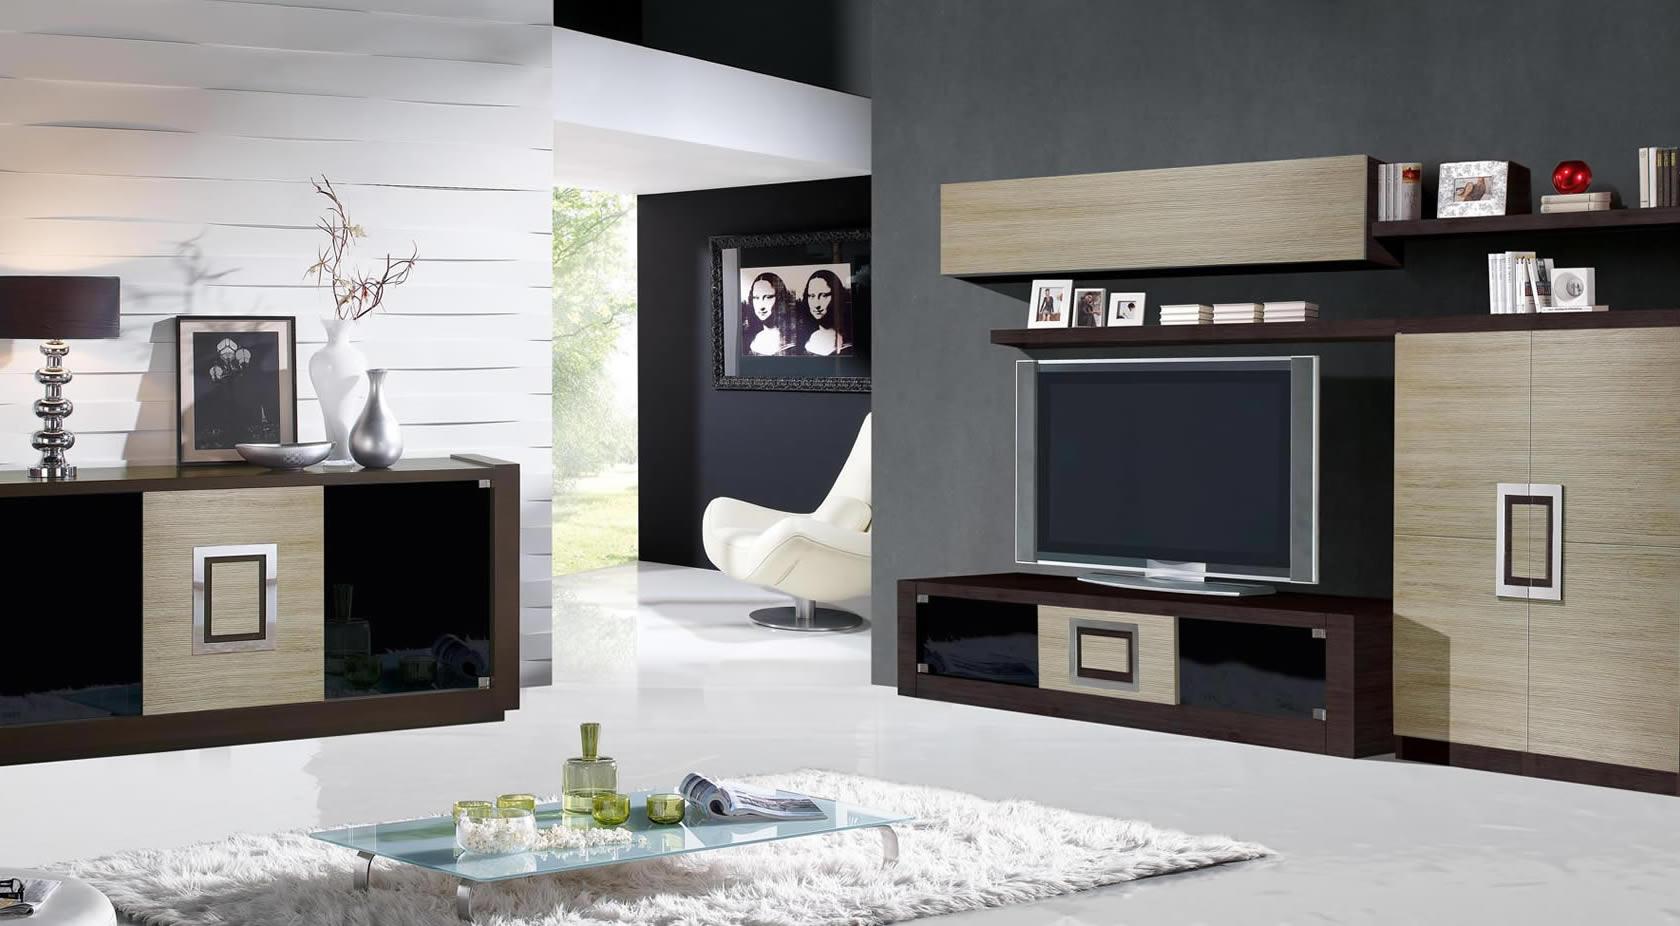 Muebles estilo colonial moderno latest elegante for Muebles estilo moderno minimalista